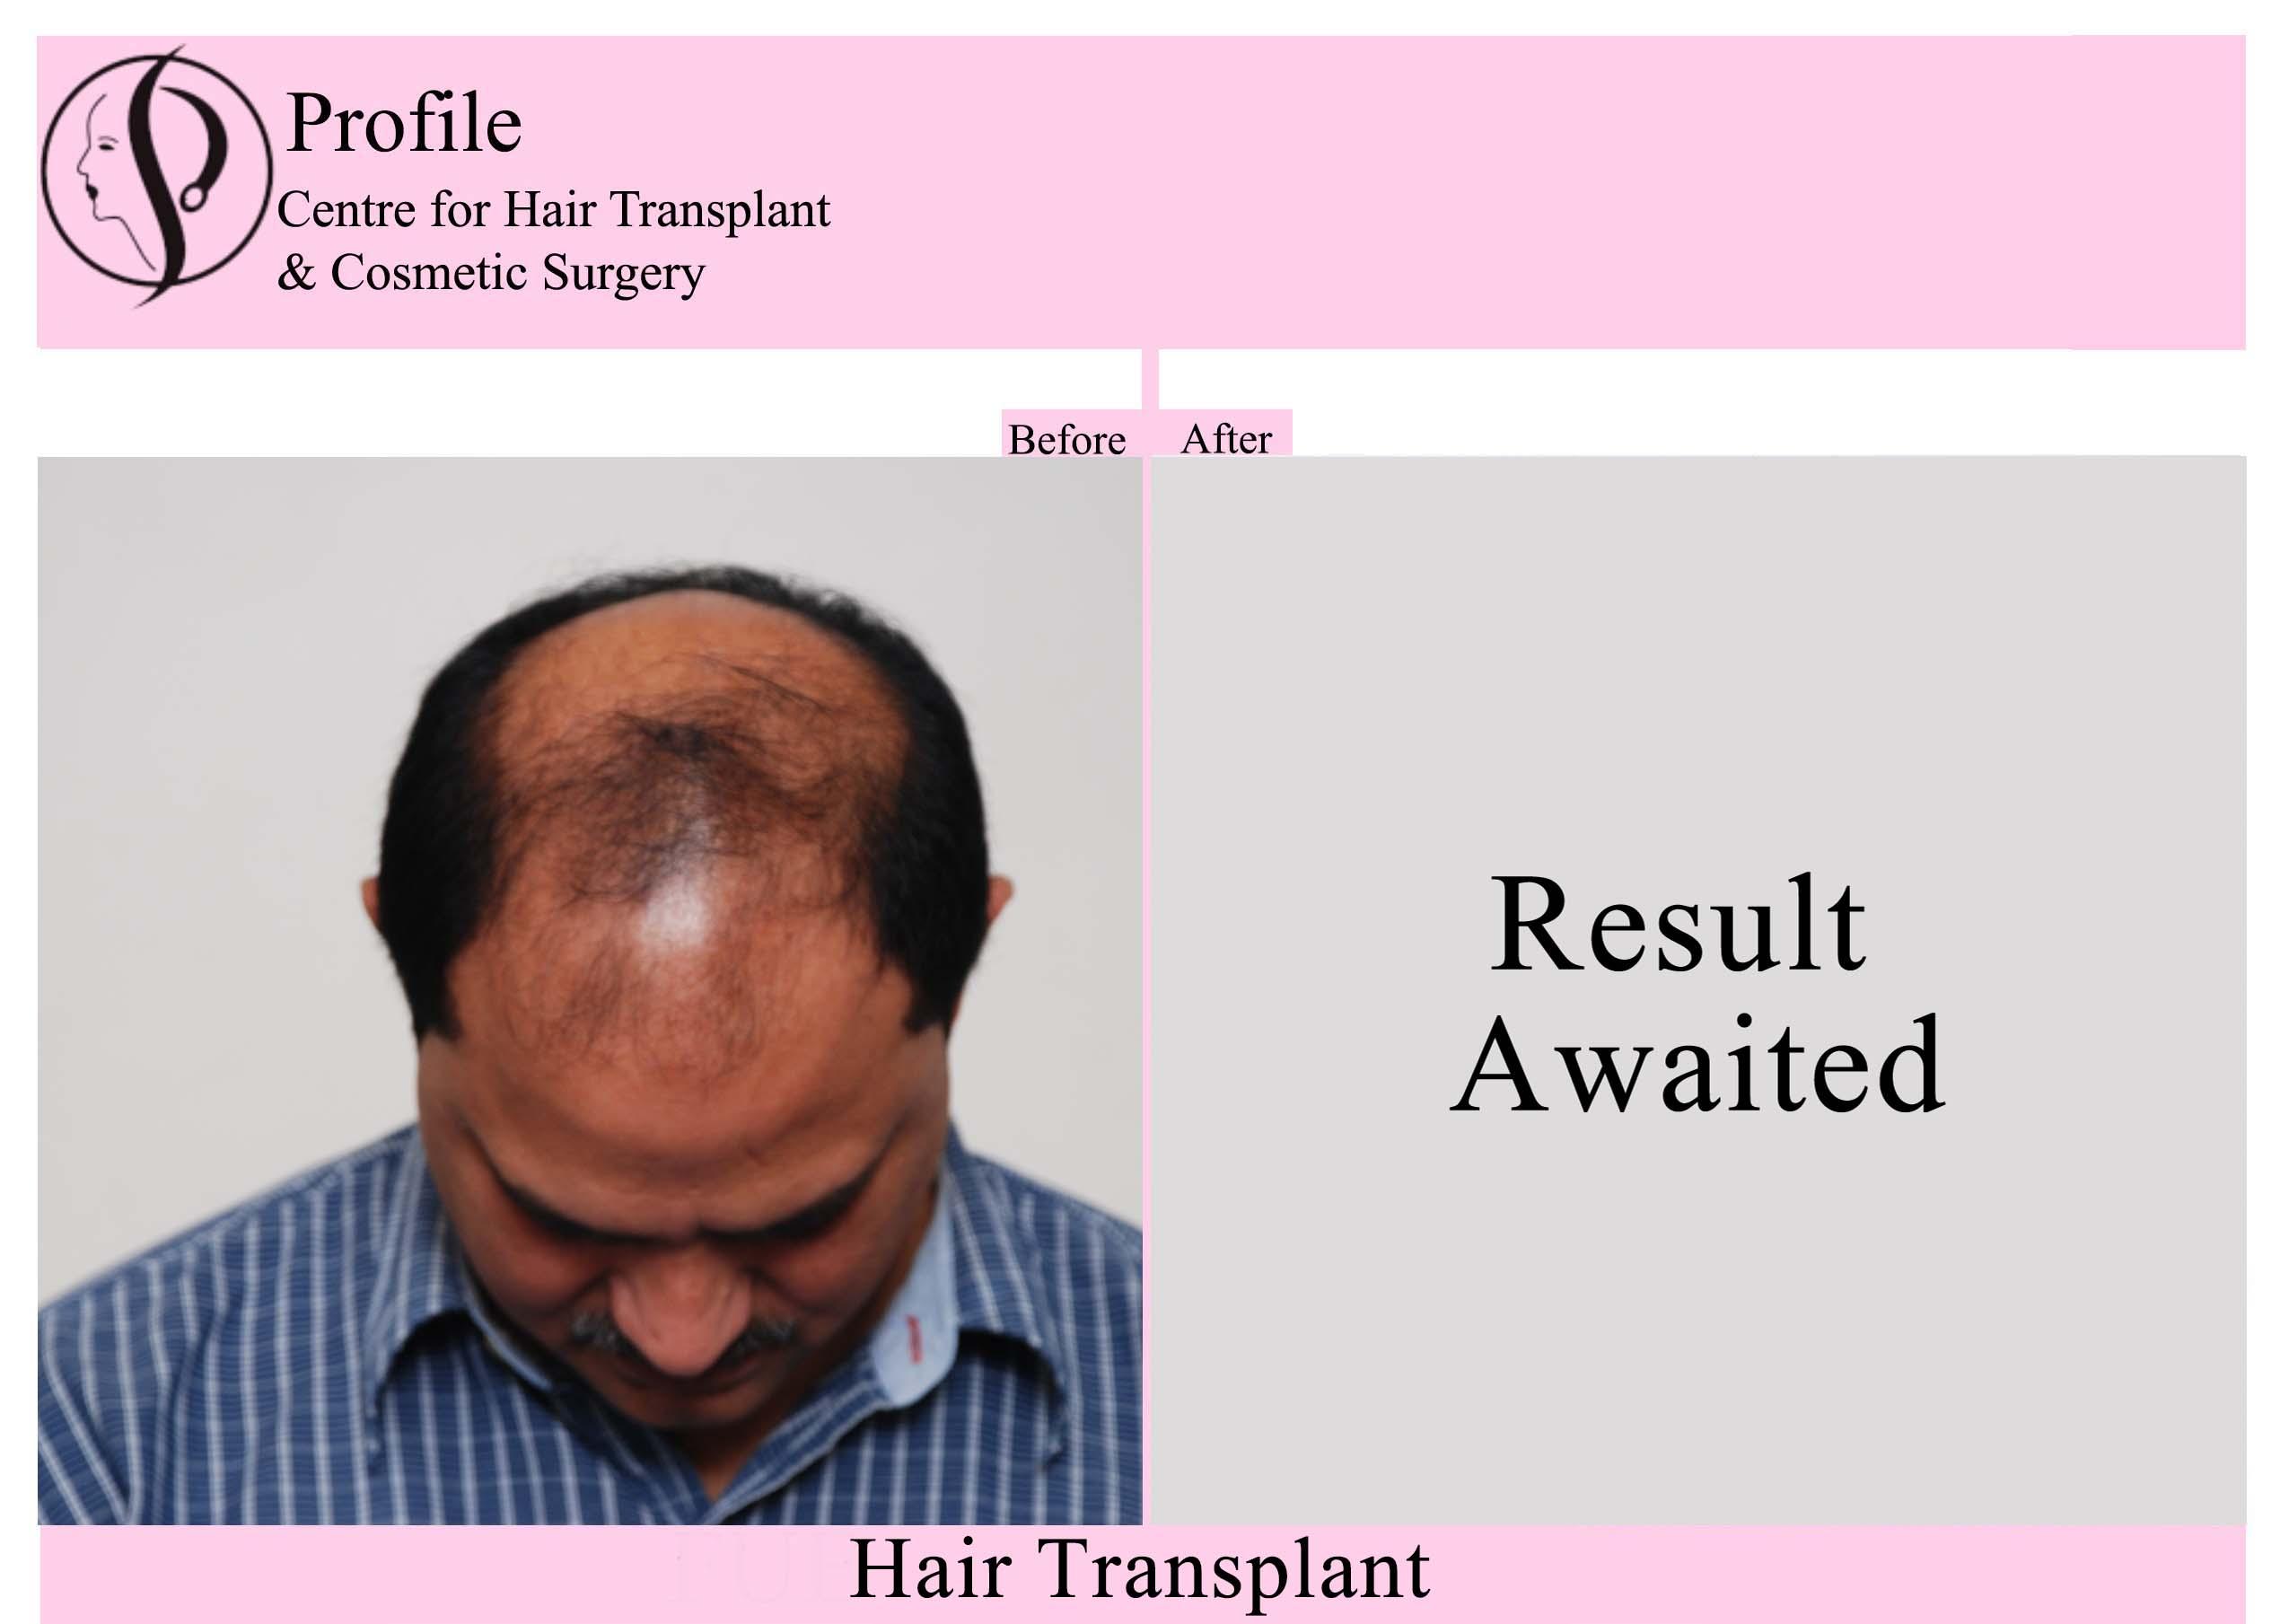 Dr. Shairaj Bhatty